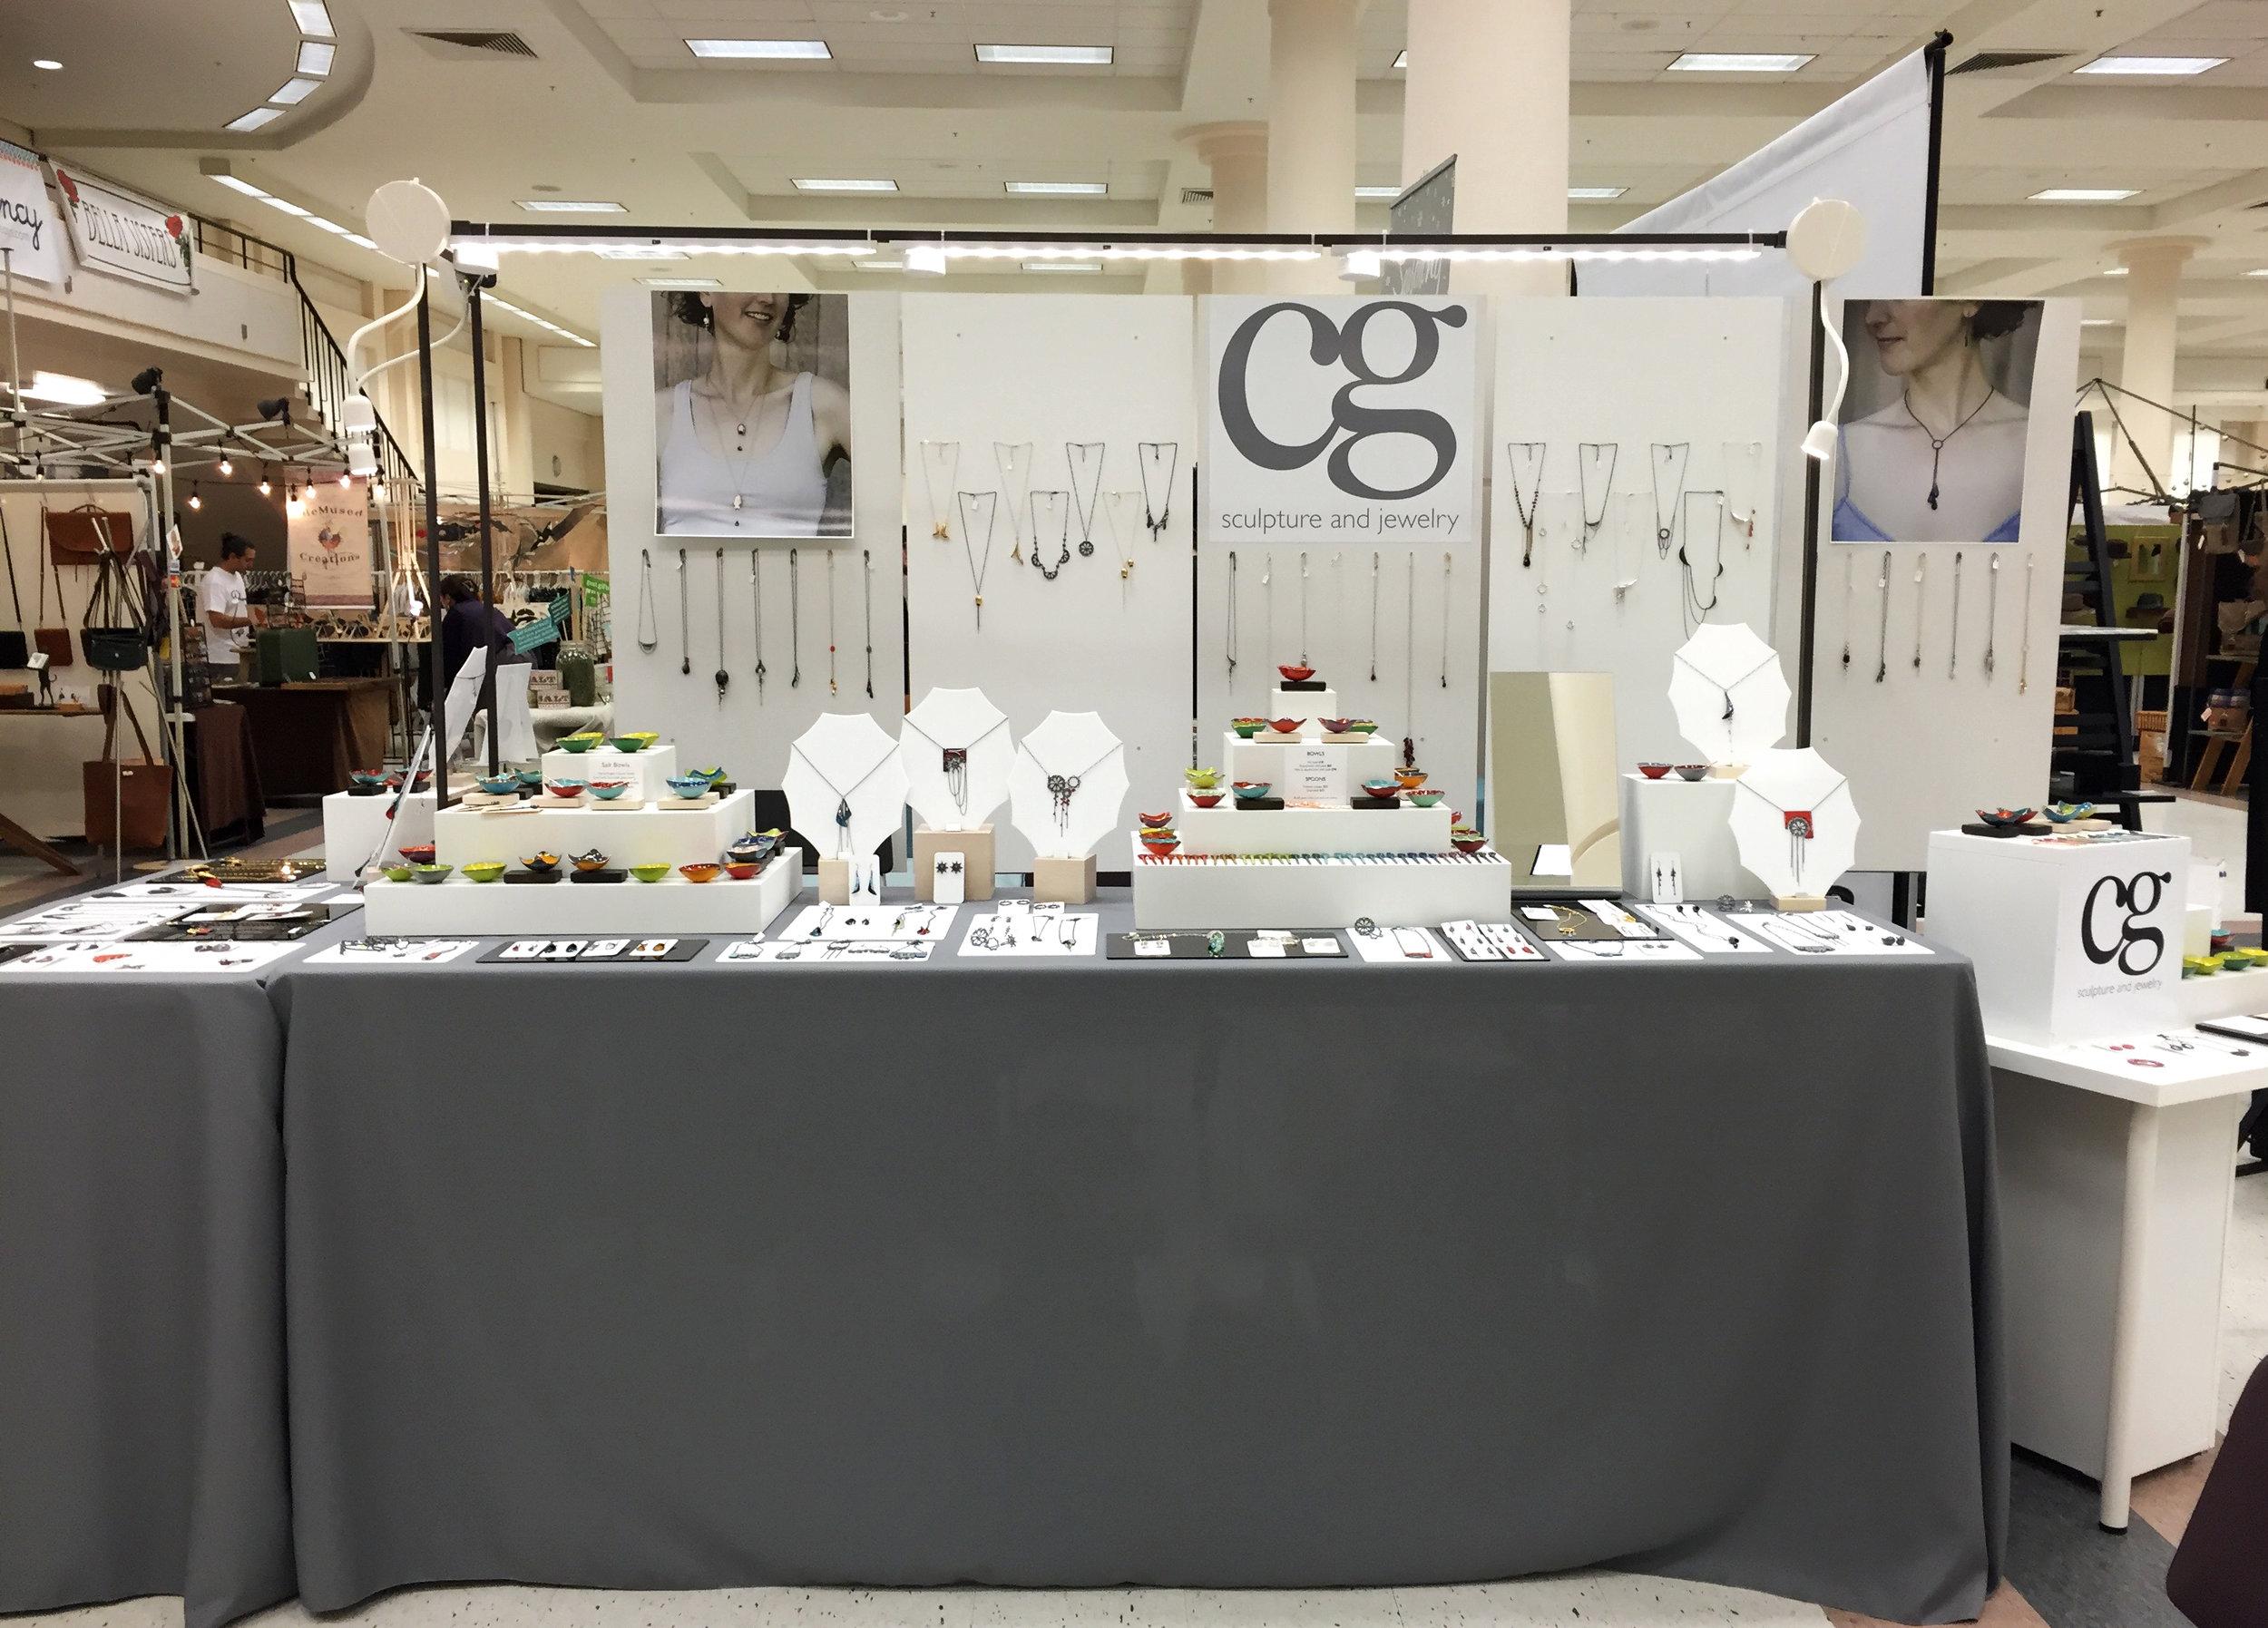 CG-Grisez-sculpture-jewelry-booth-display.jpg